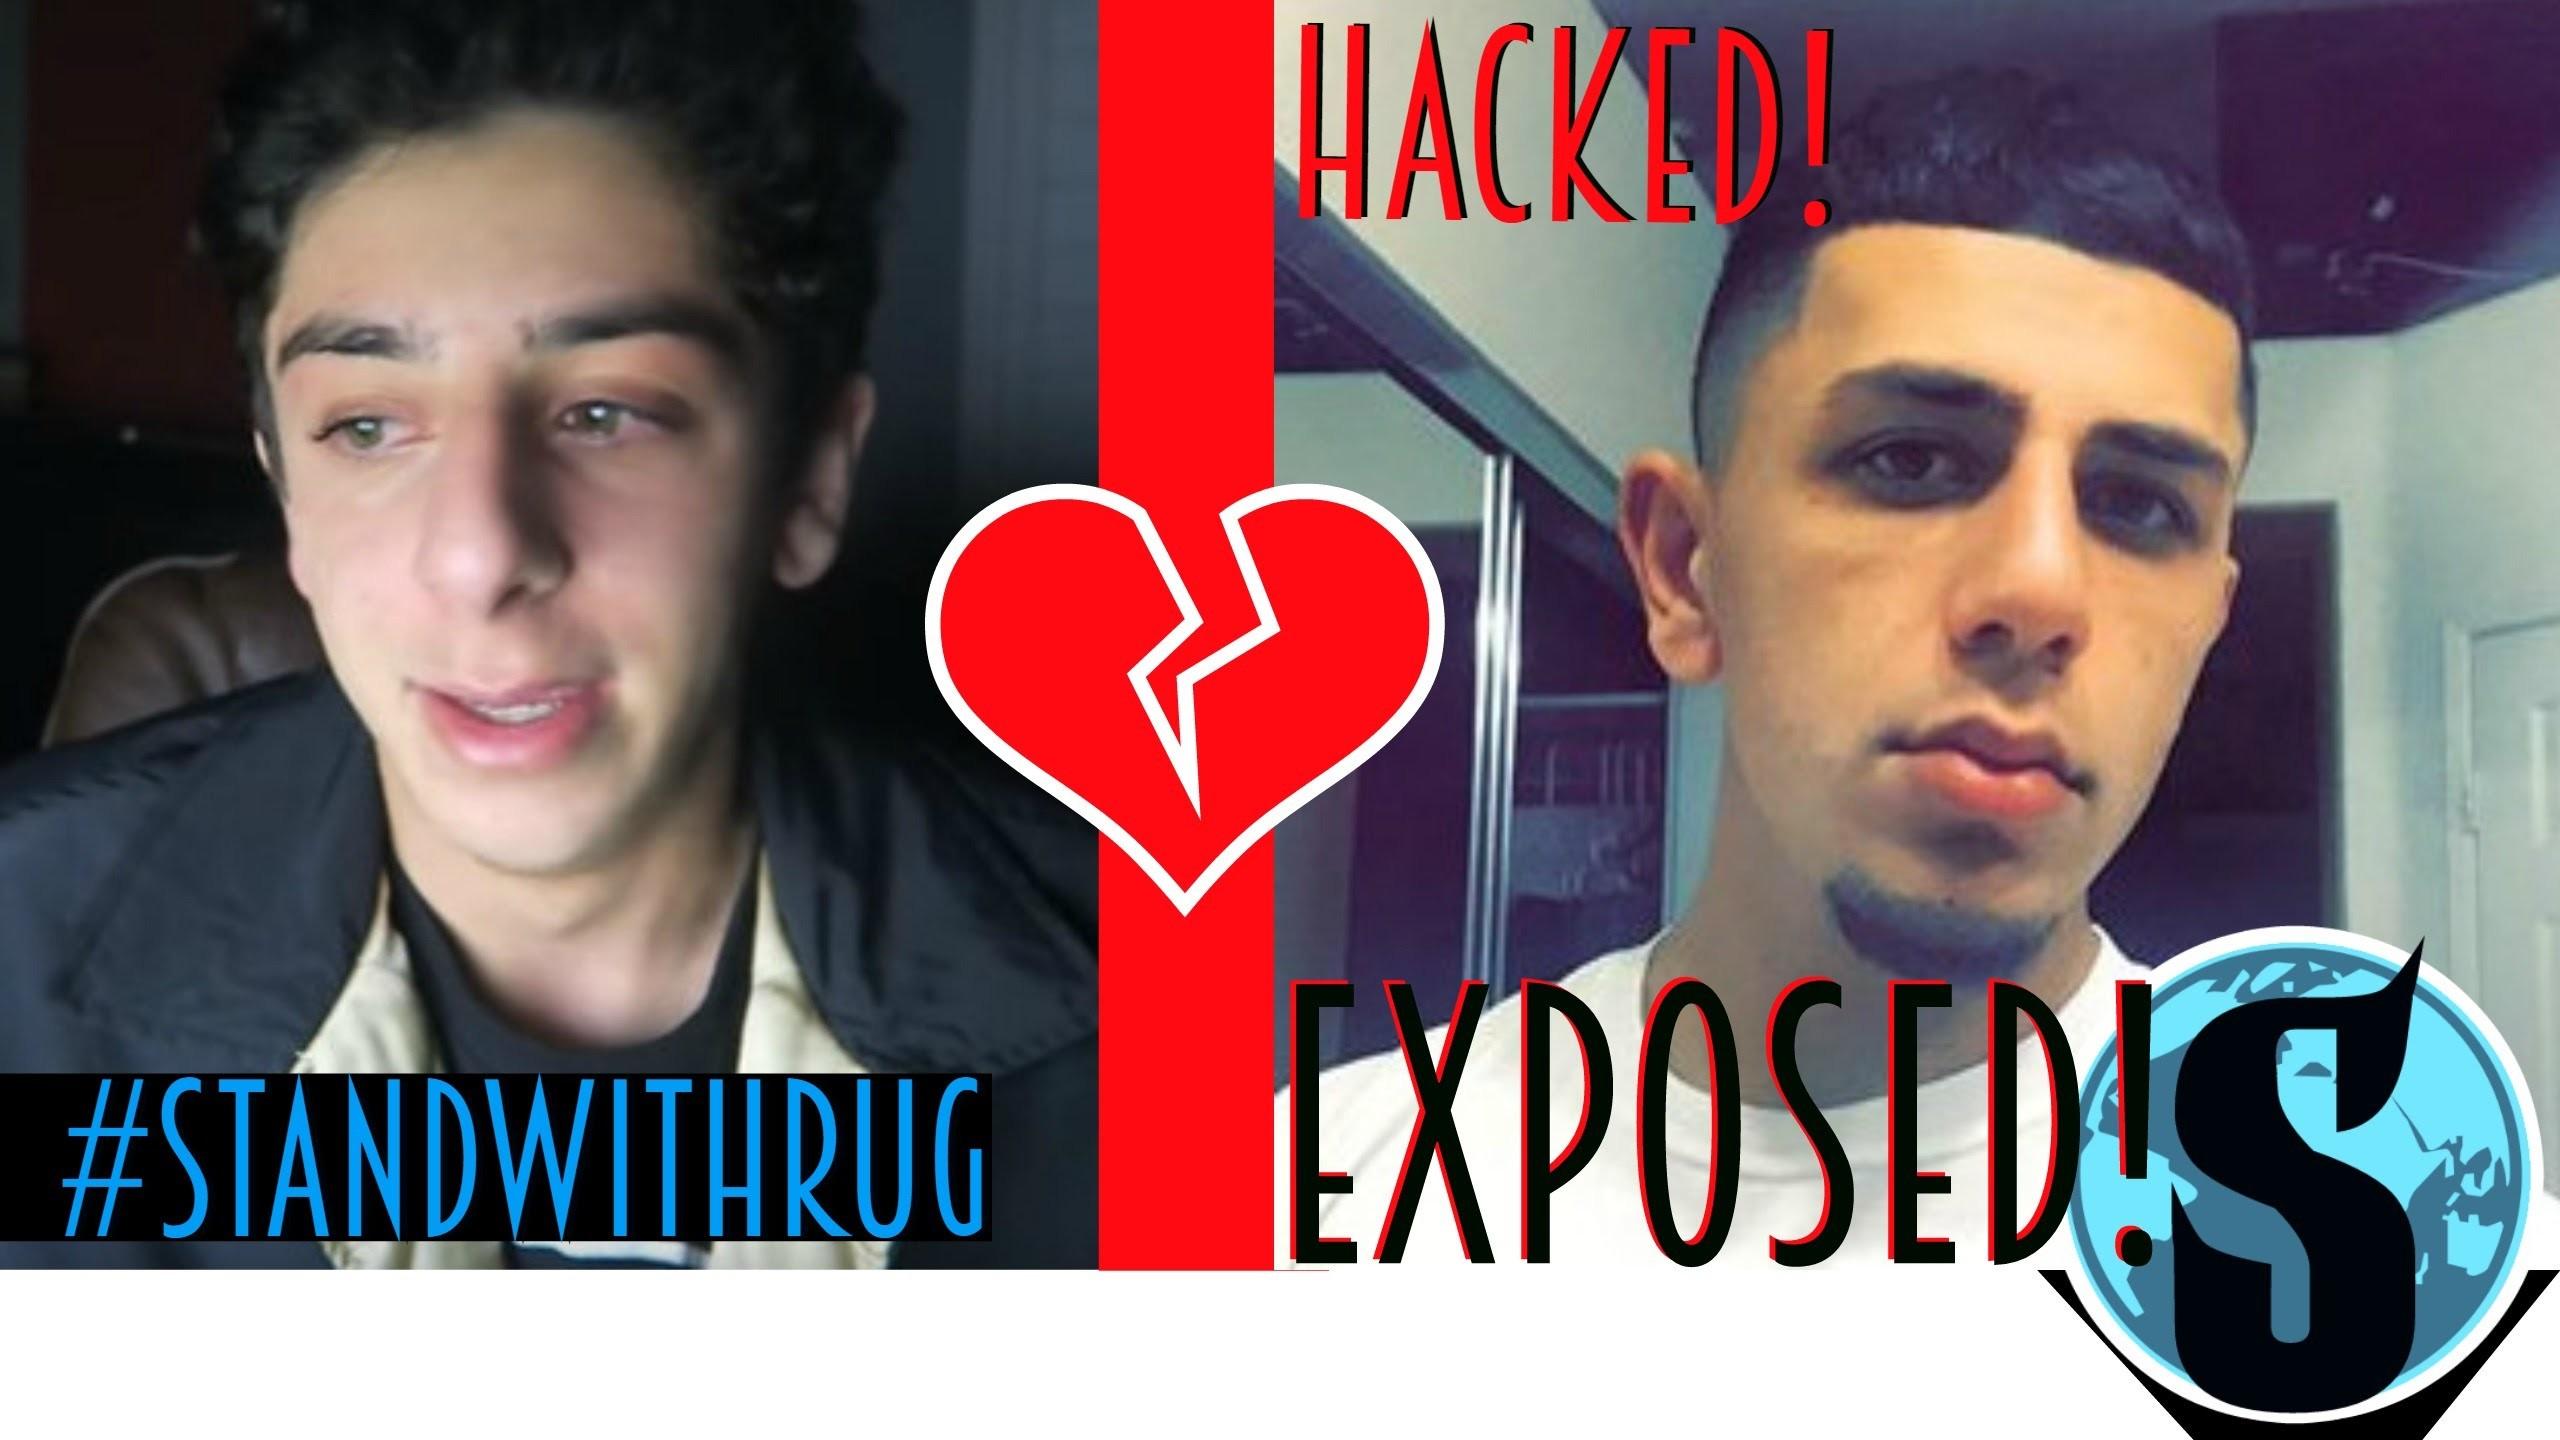 FaZe Rug Exposes Brawadis, Brawadis Hacked & Videos Deleted, Keemstar, FaZe  Clan – YouTube